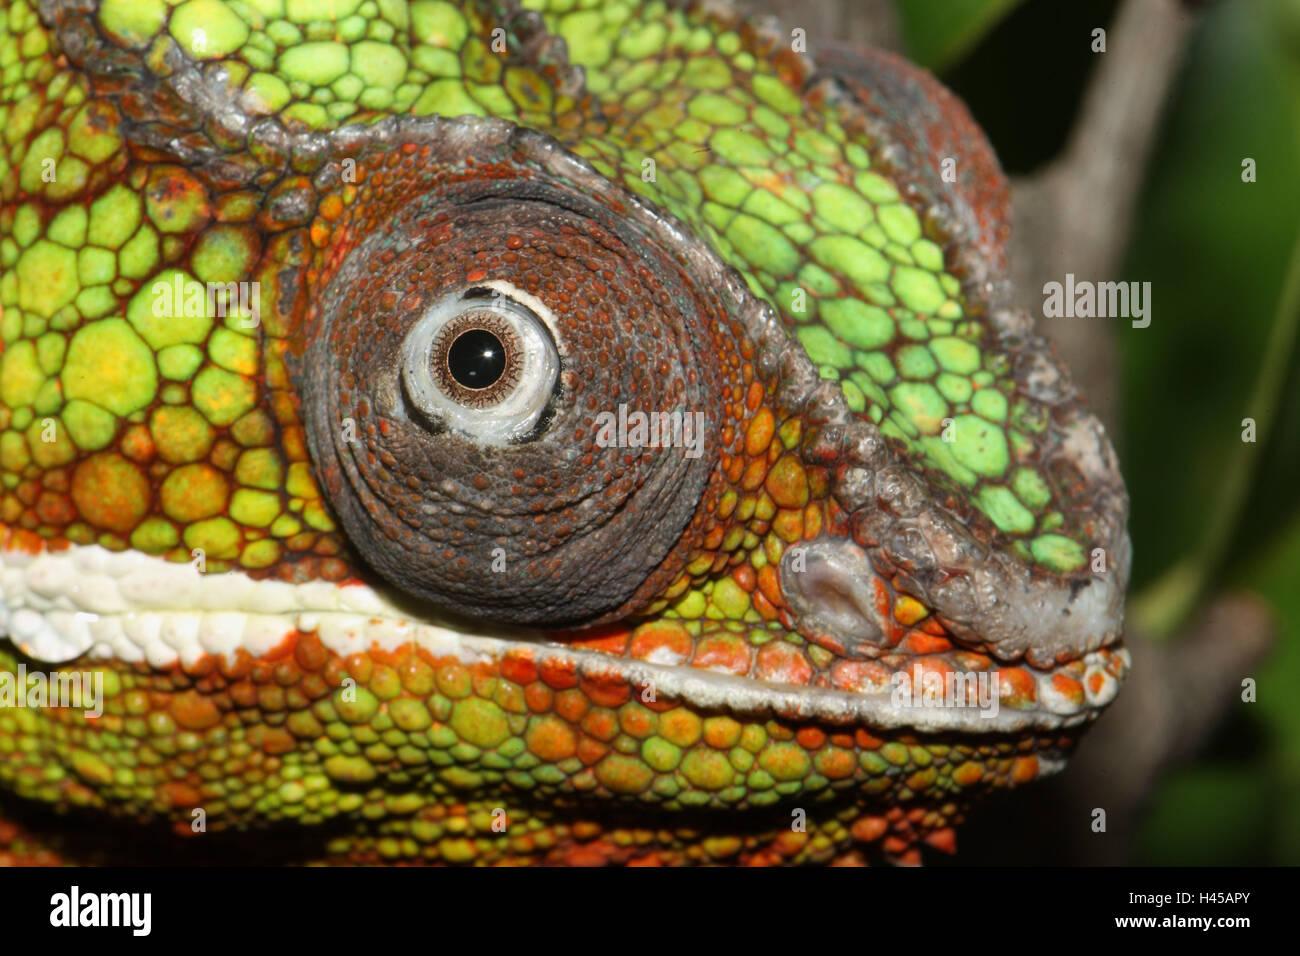 Reptilien, Tier, wildes Tier, Chamäleon, Furcifer Pardalis, Madagaskar, skaliert Reptilien, Kopf, Nahaufnahme, Stockbild